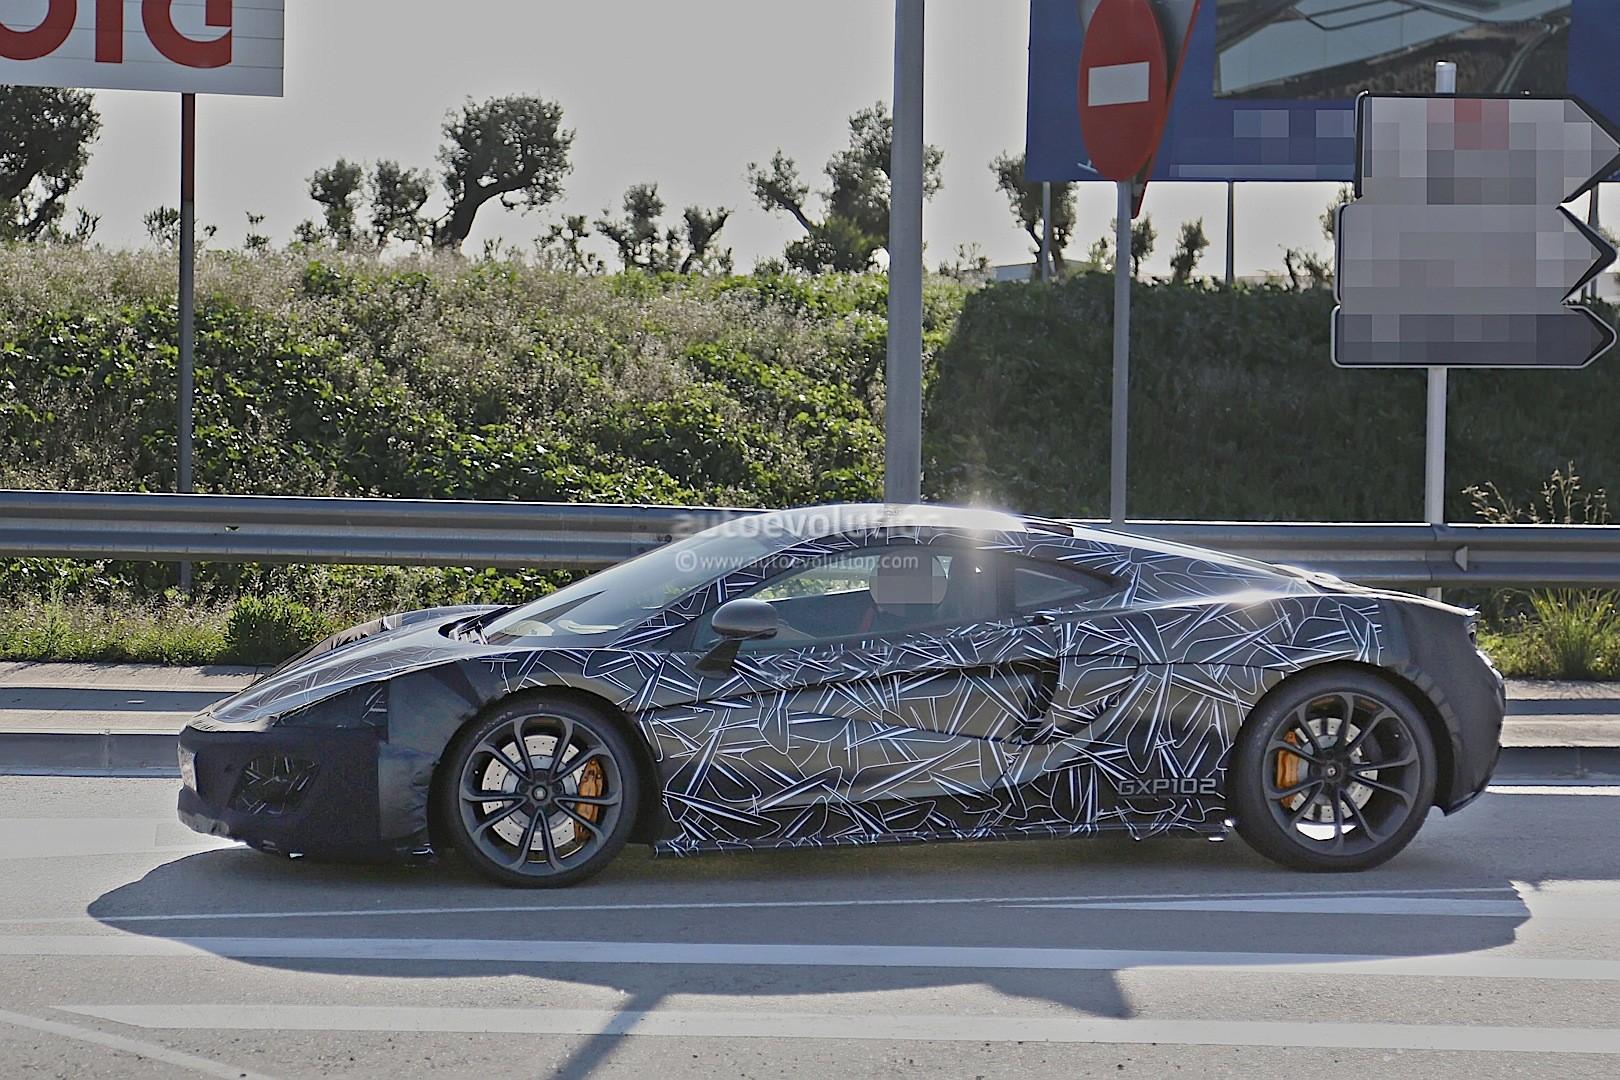 Mclaren Reveals Sports Series Carbon Fiber Monocoque Tub